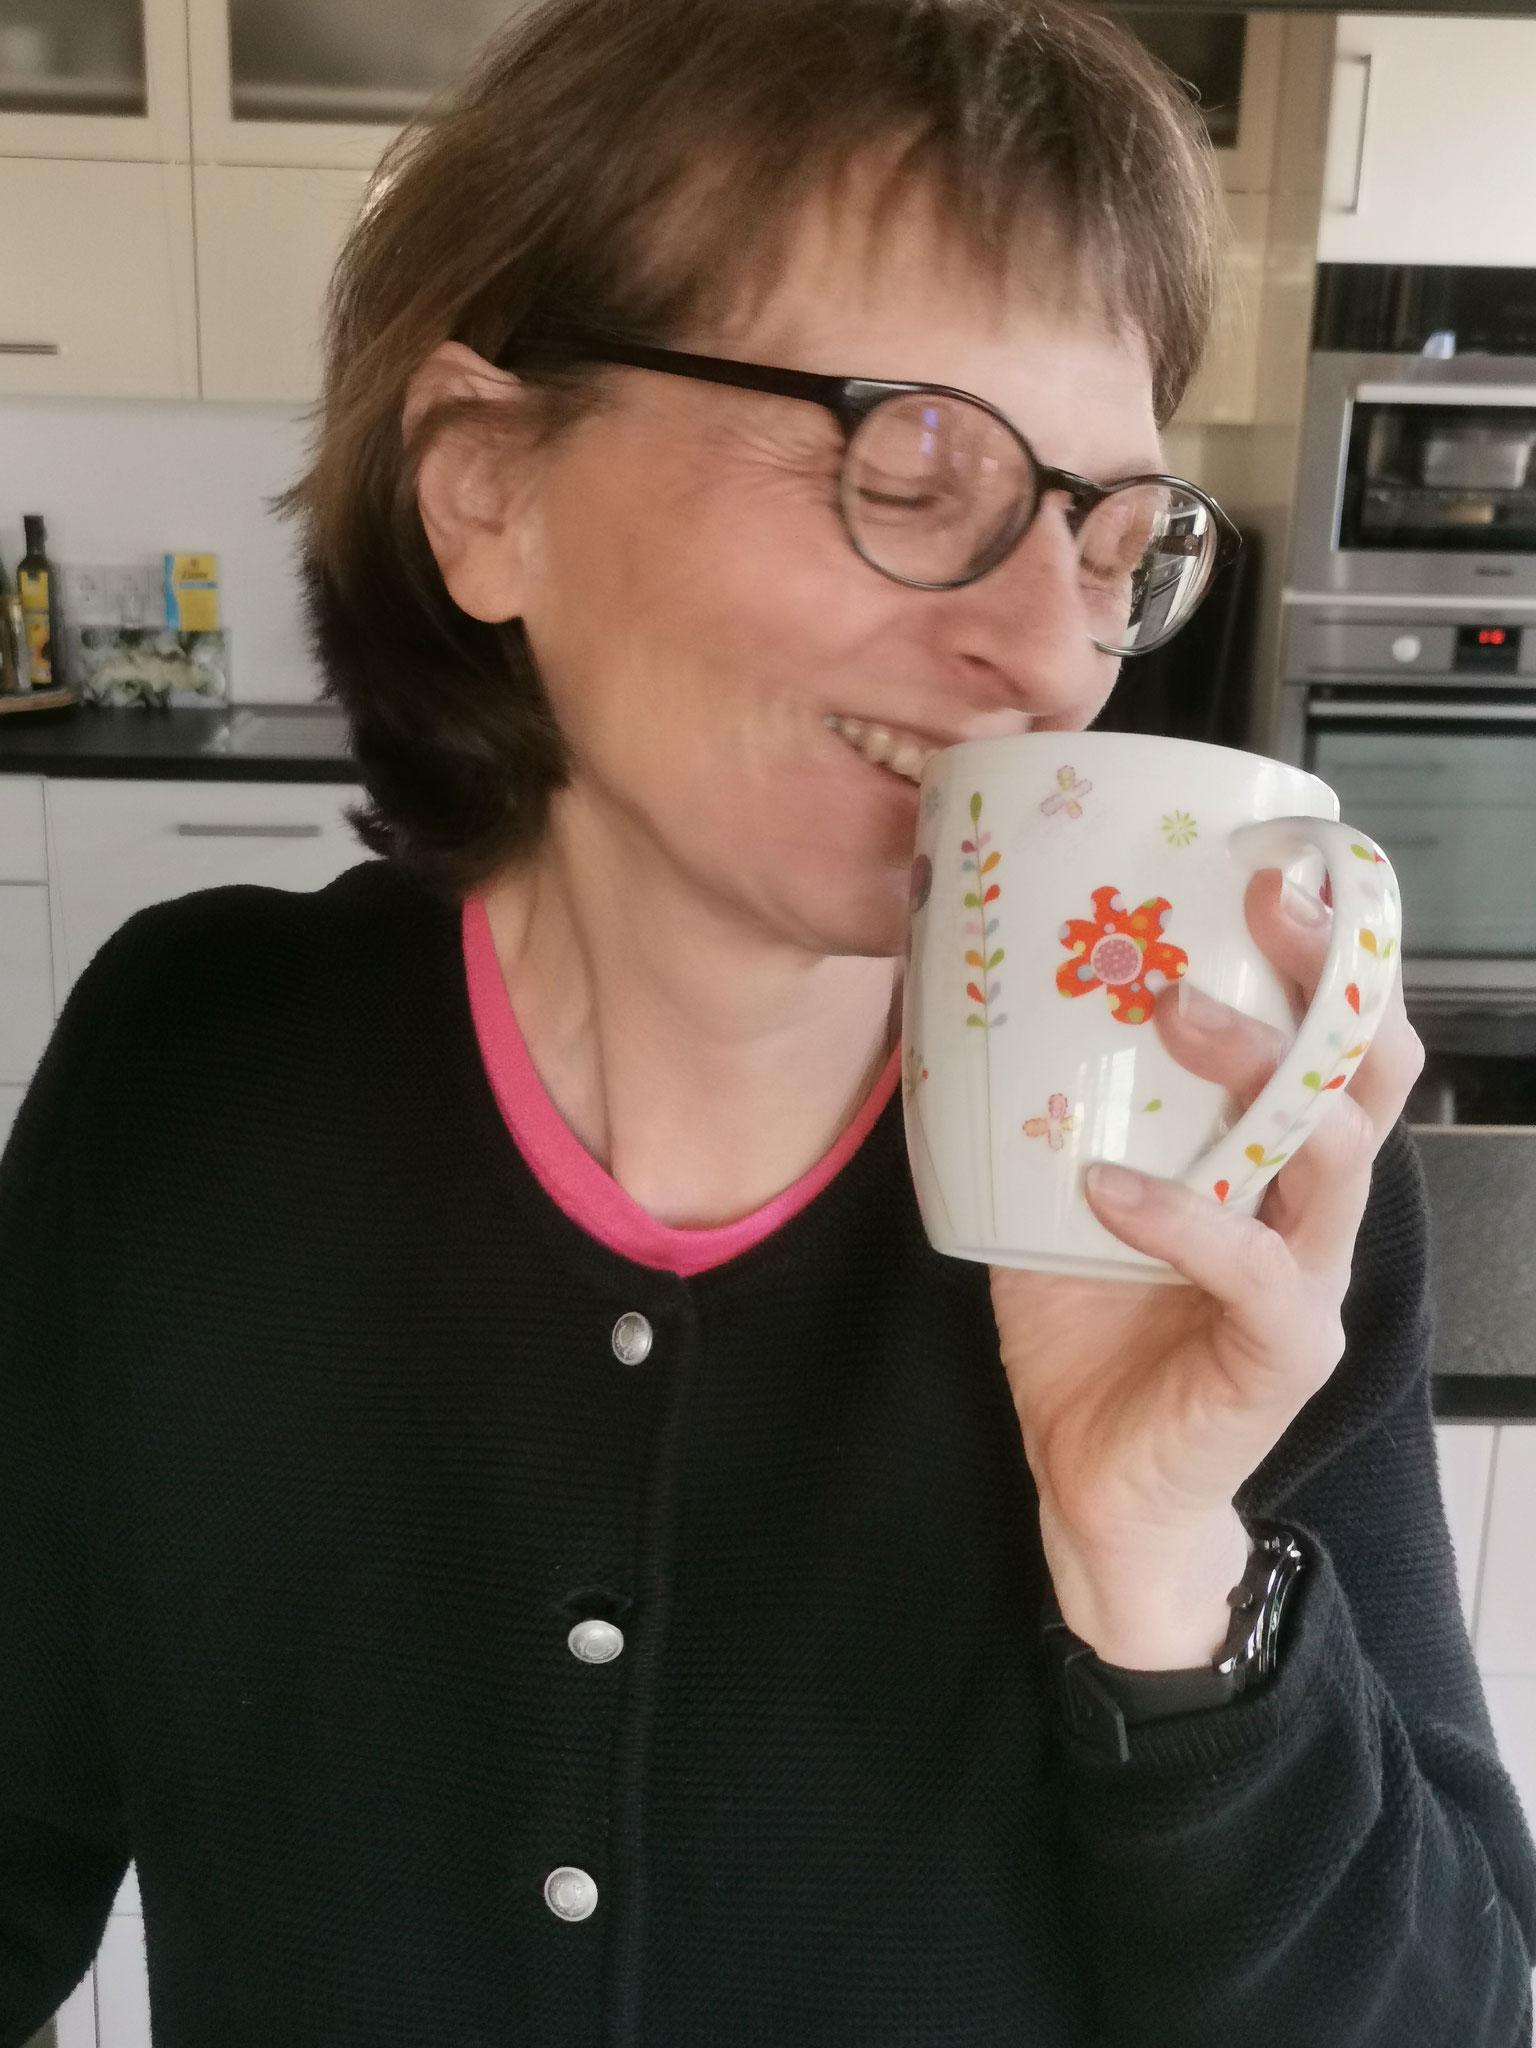 dringend meinen Kaffee ....